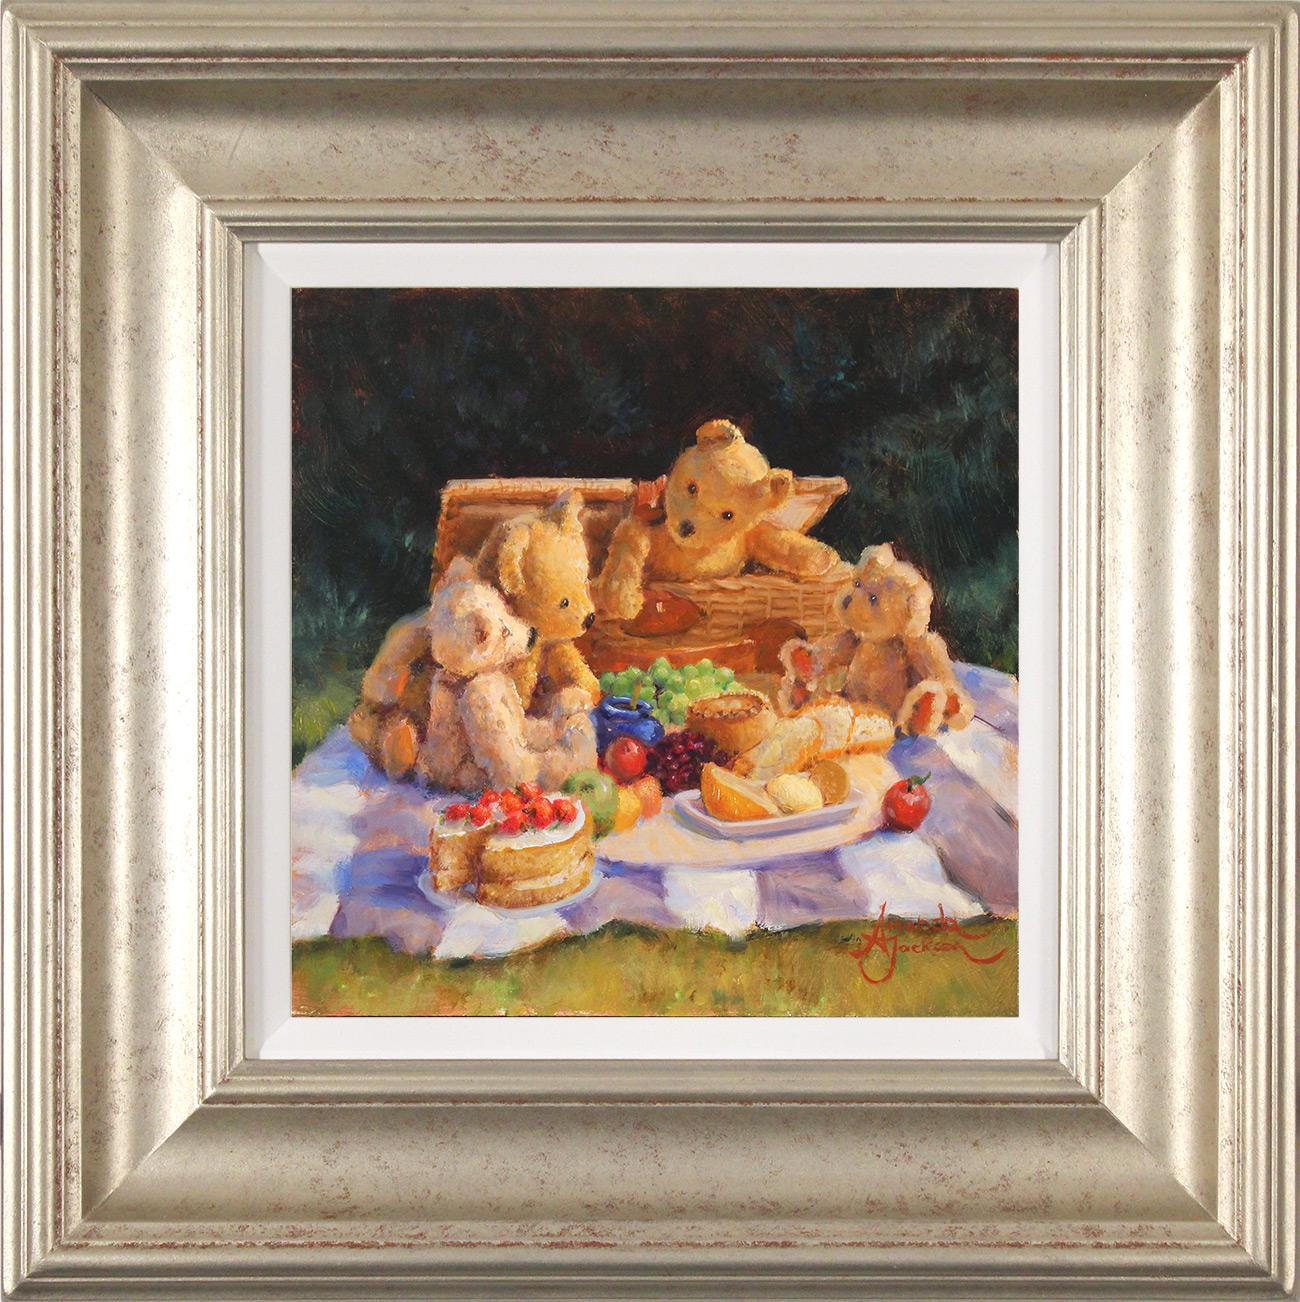 Amanda Jackson, Original oil painting on panel, Teddy Bear's  Picnic Click to enlarge